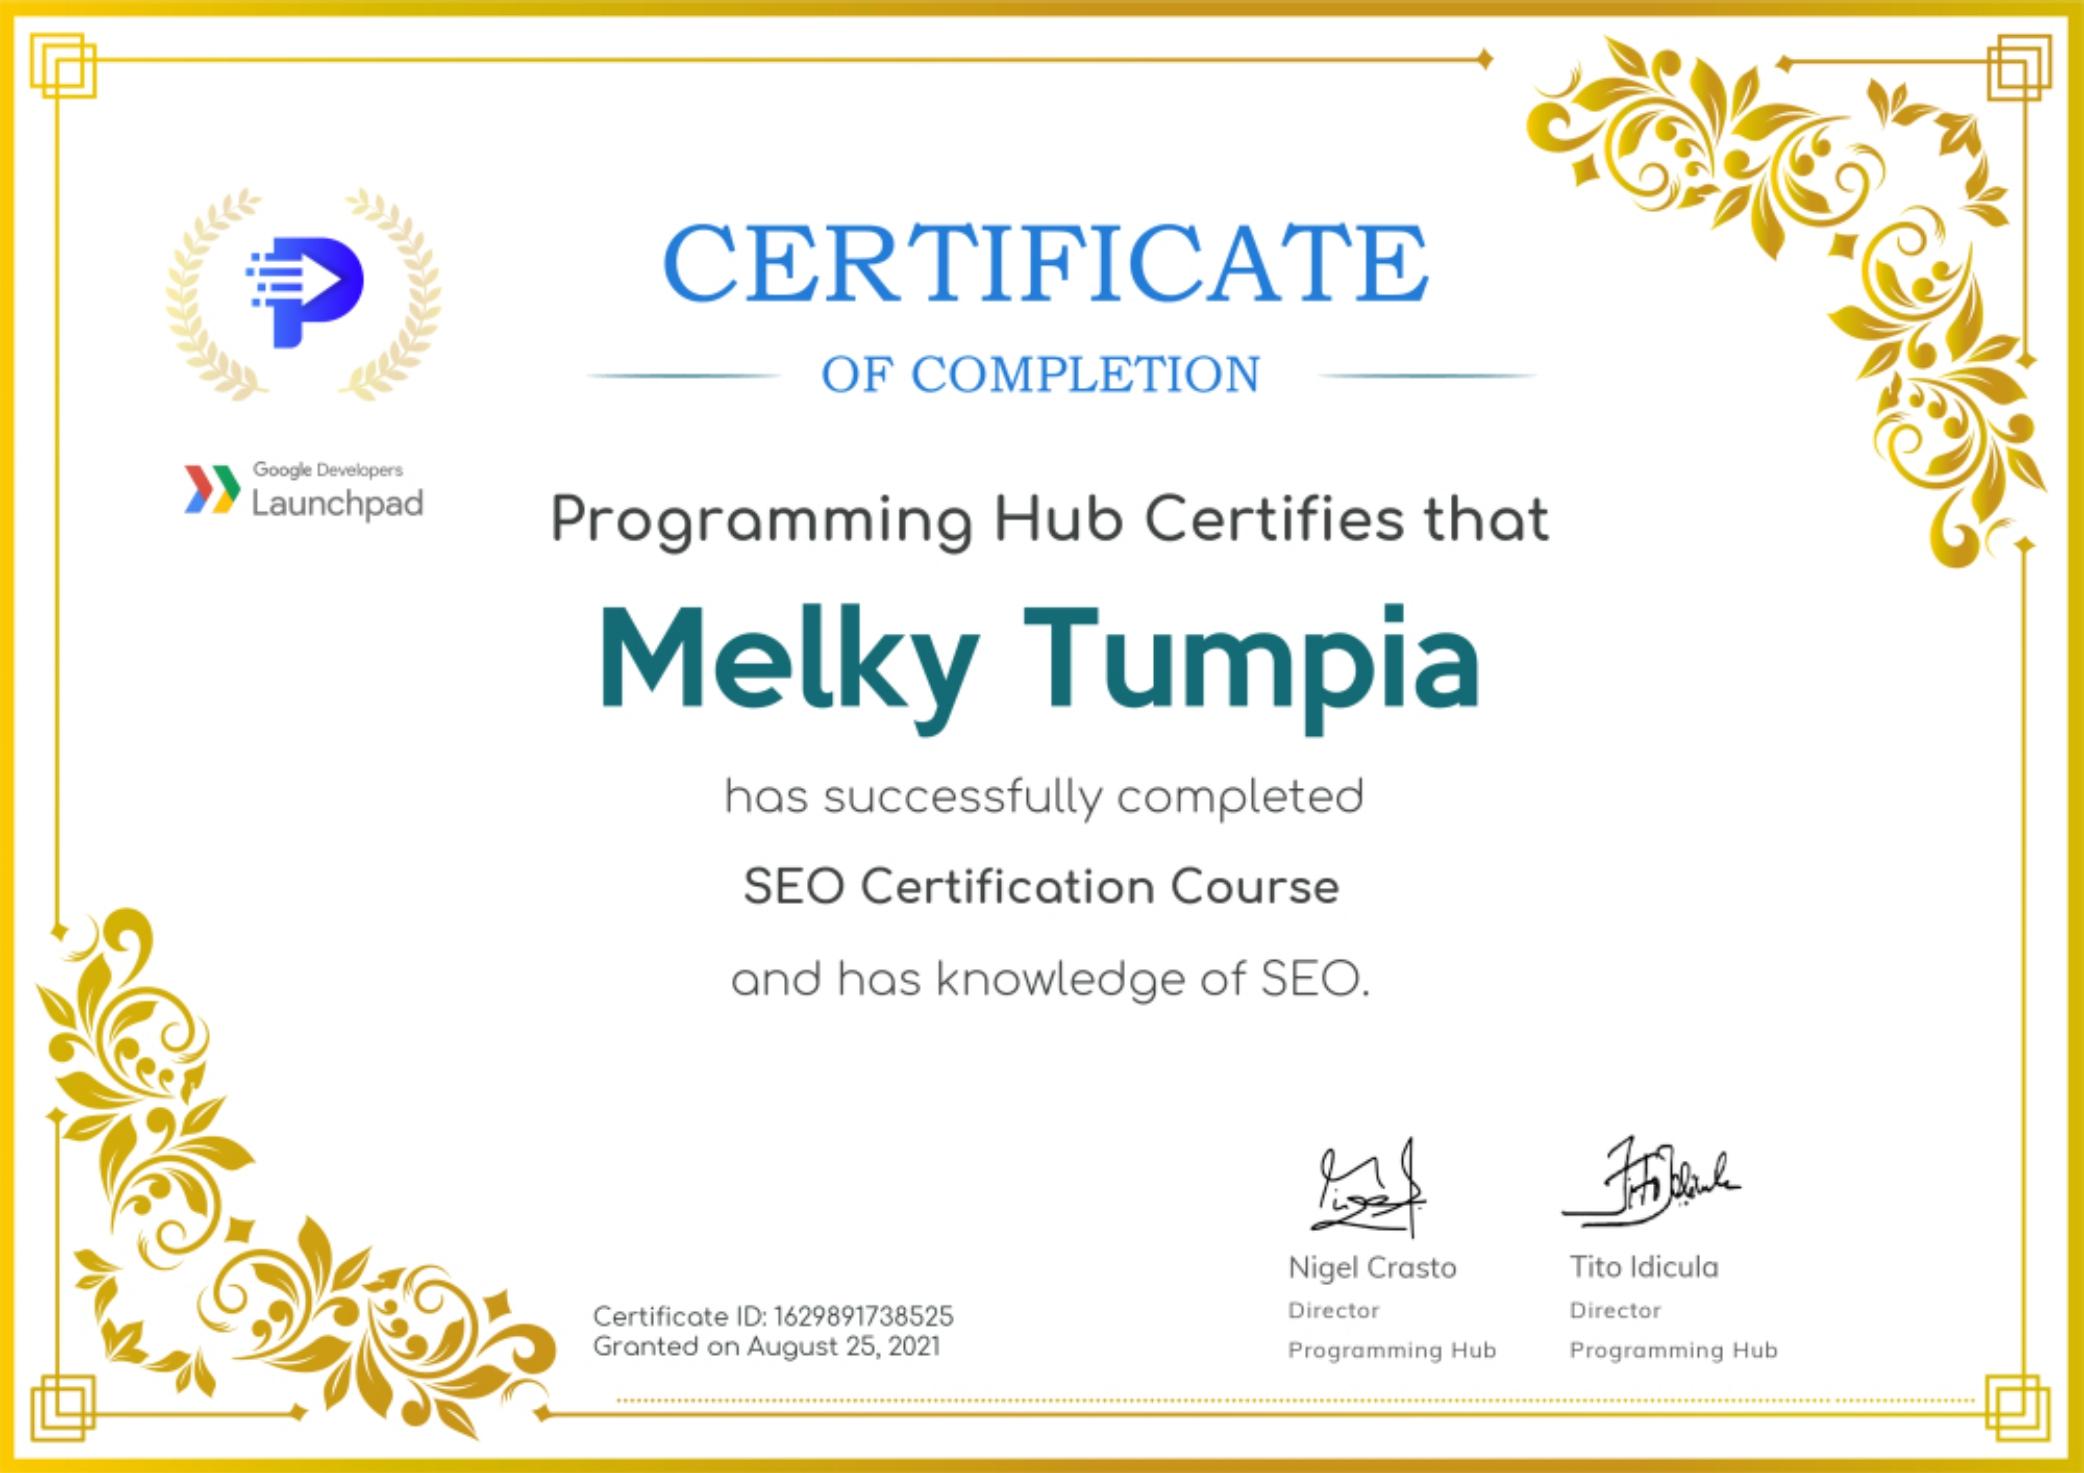 SEO Certification Course (Google Developers Launchpad & ProgrammingHub)